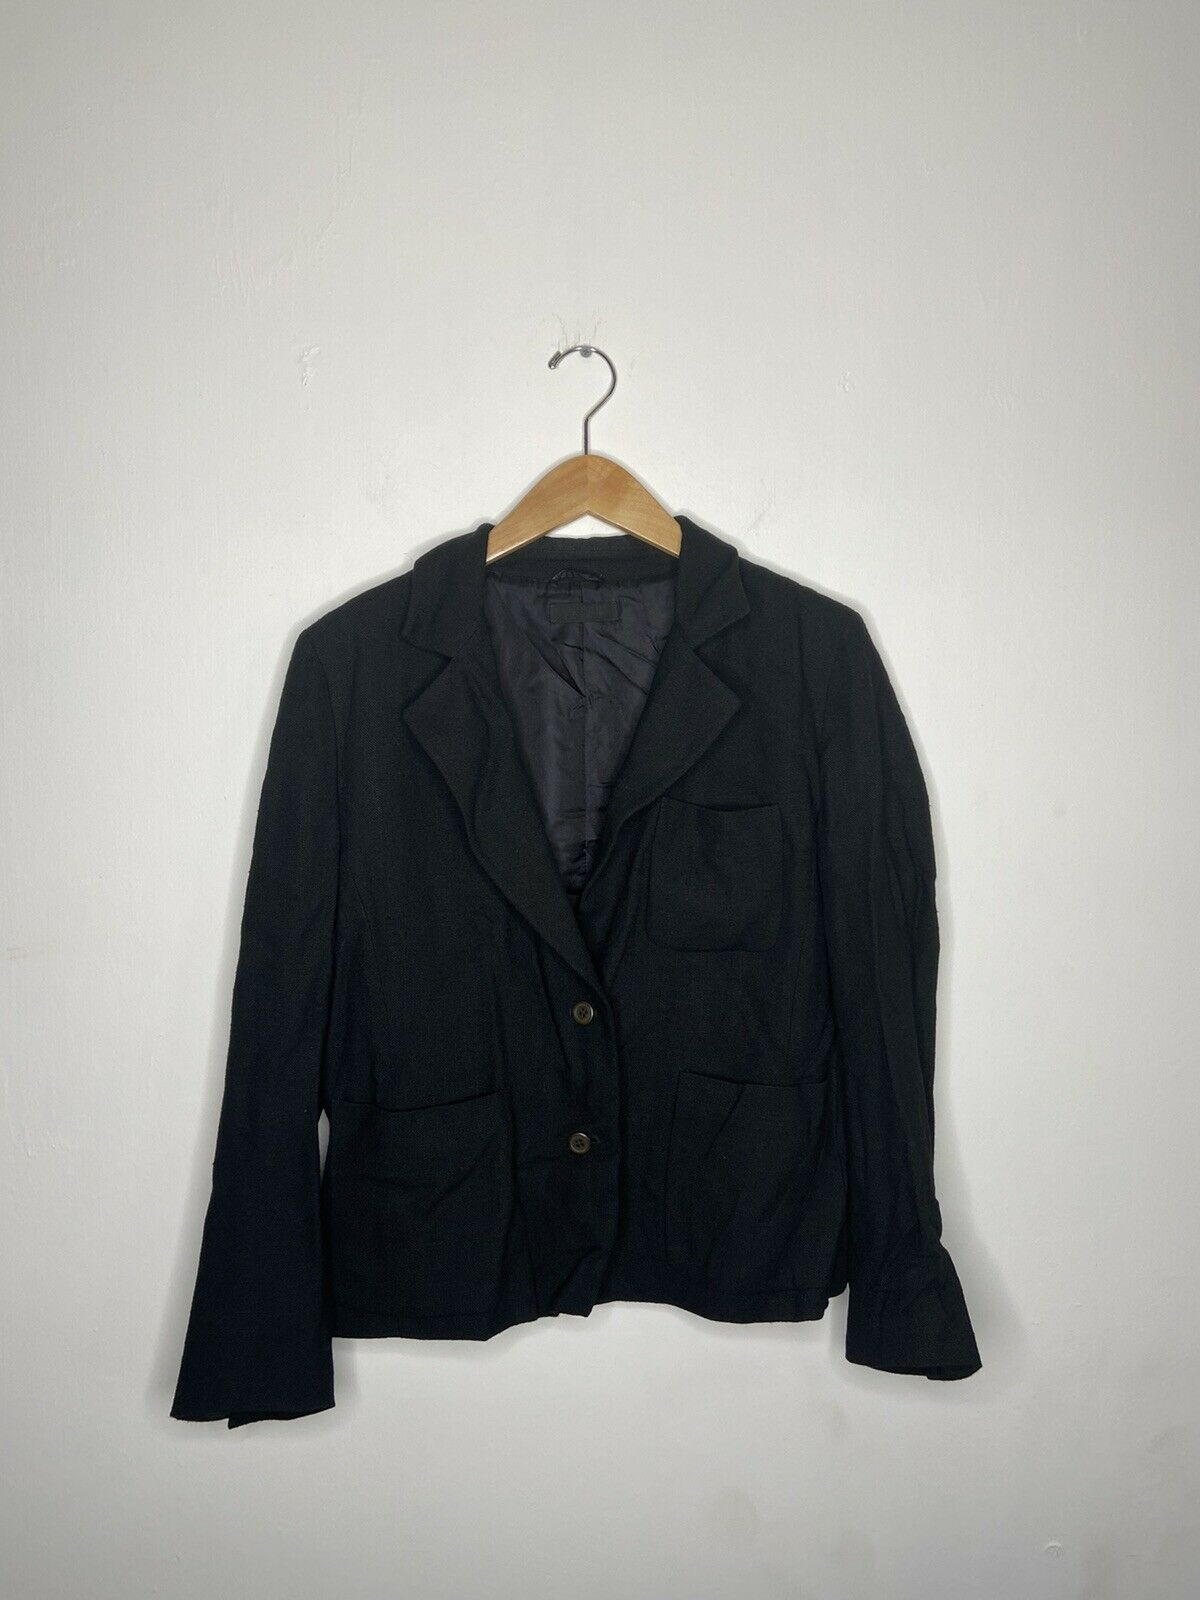 Vintage 90s Prada Womens Black Blazer Suit Jacket… - image 1